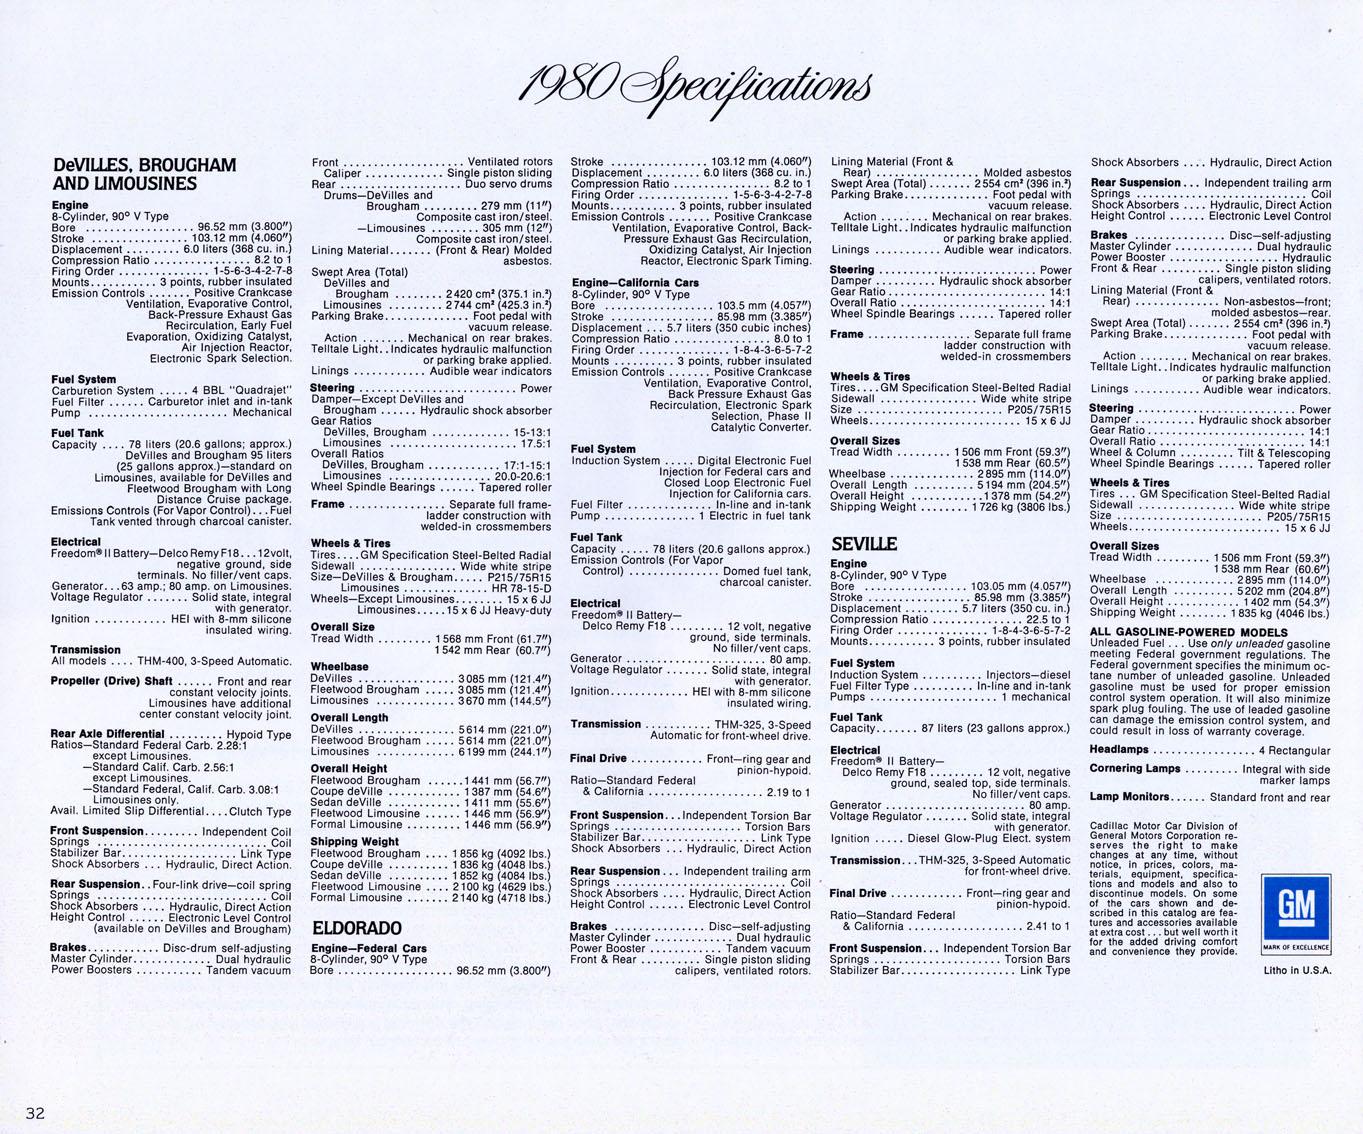 1980 Cadillac Brochure